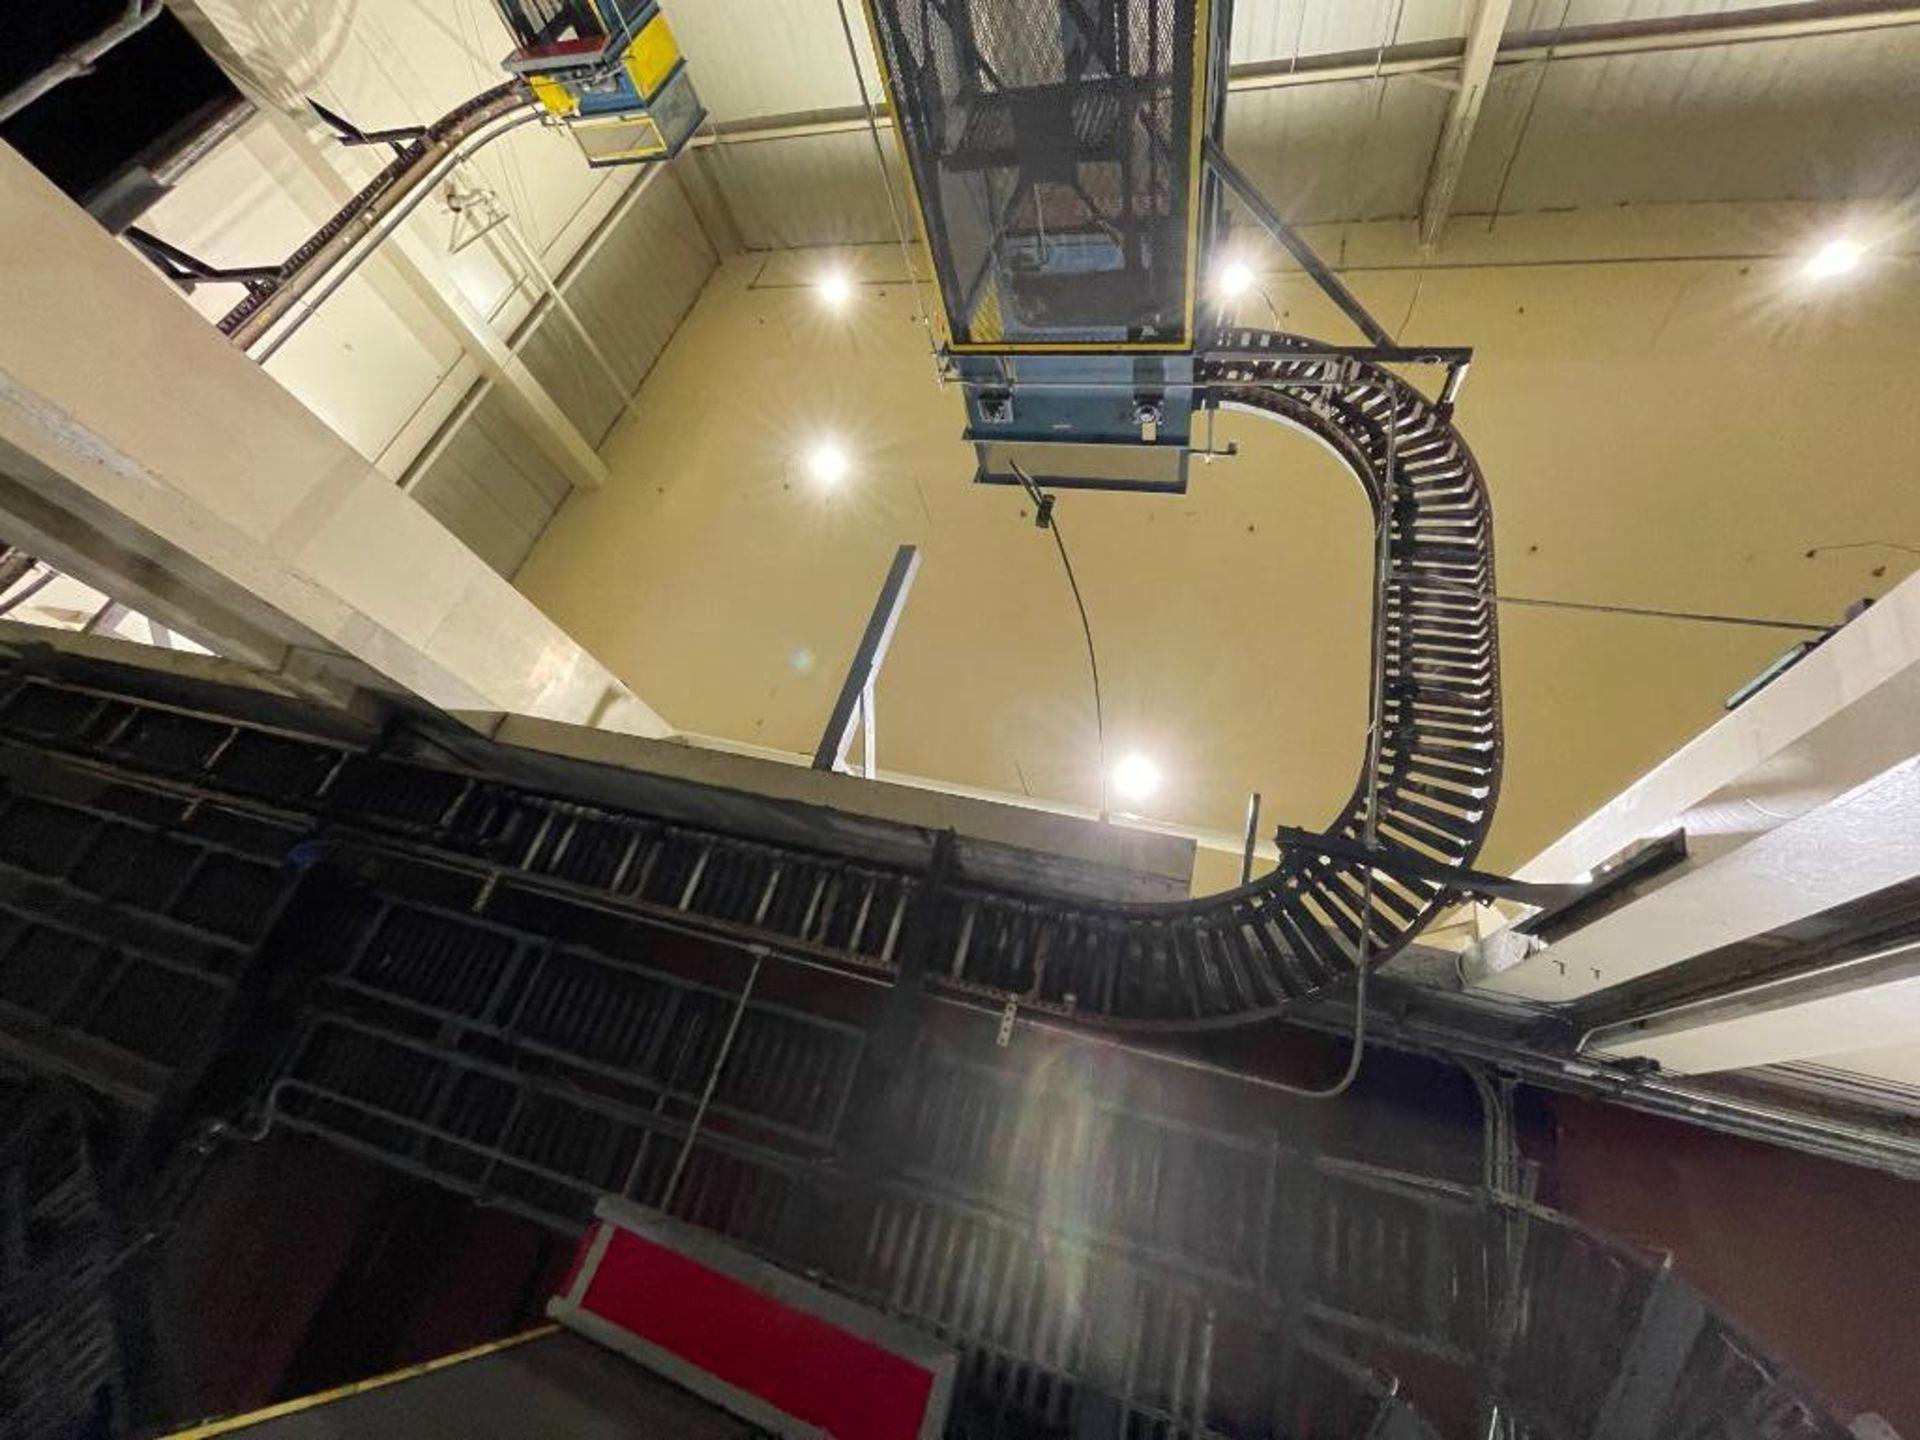 overhead power case conveyor - Image 2 of 5